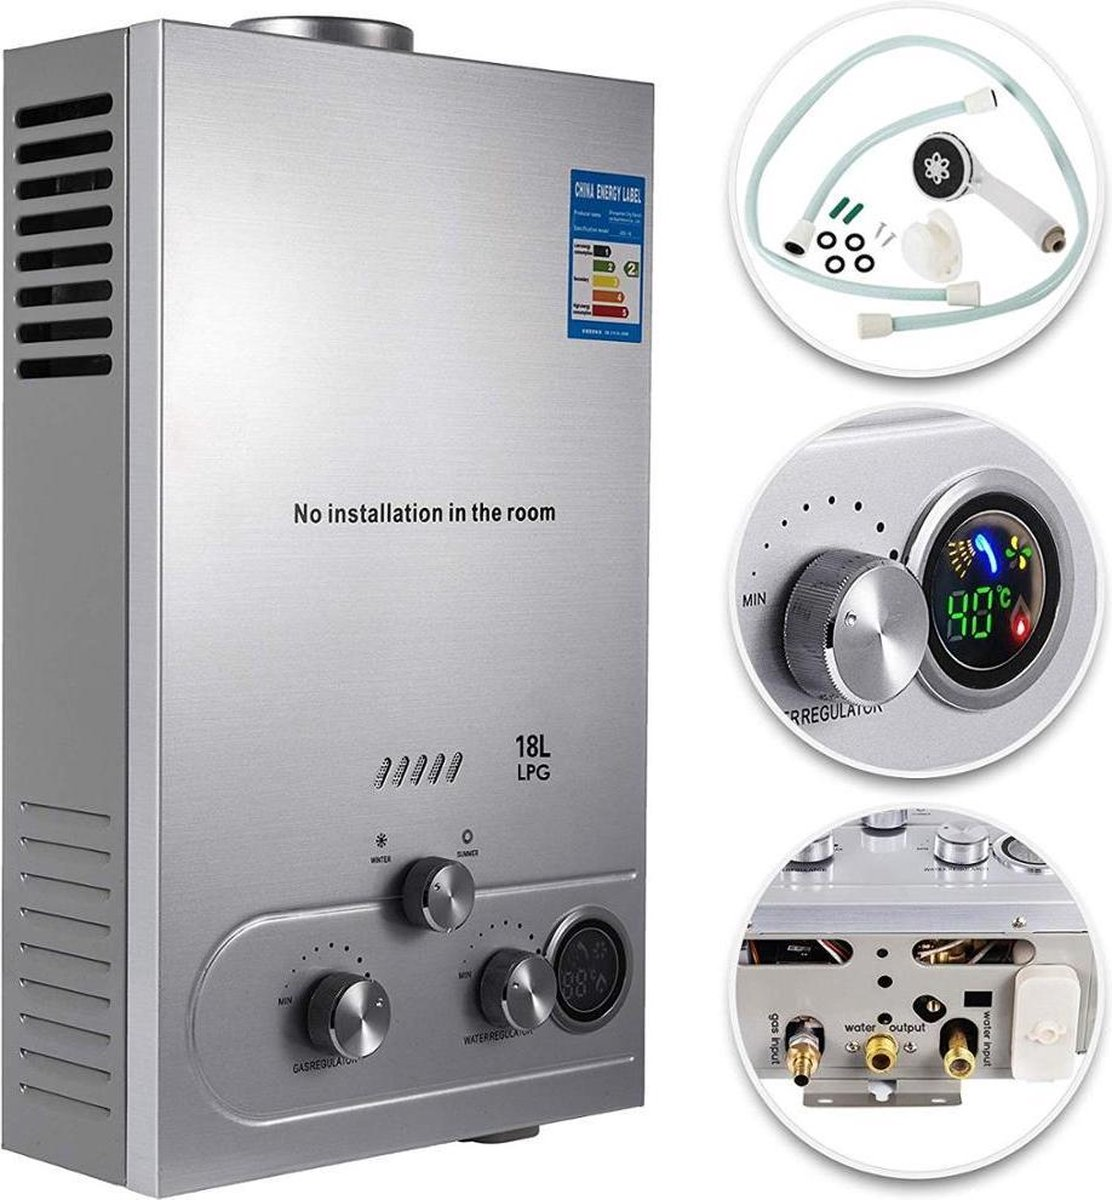 Dexters  Propaan - Boiler -  LPG Geiser 16 Liter / minuut Boiler - Ideaal Voor Camper  - Caravan - B